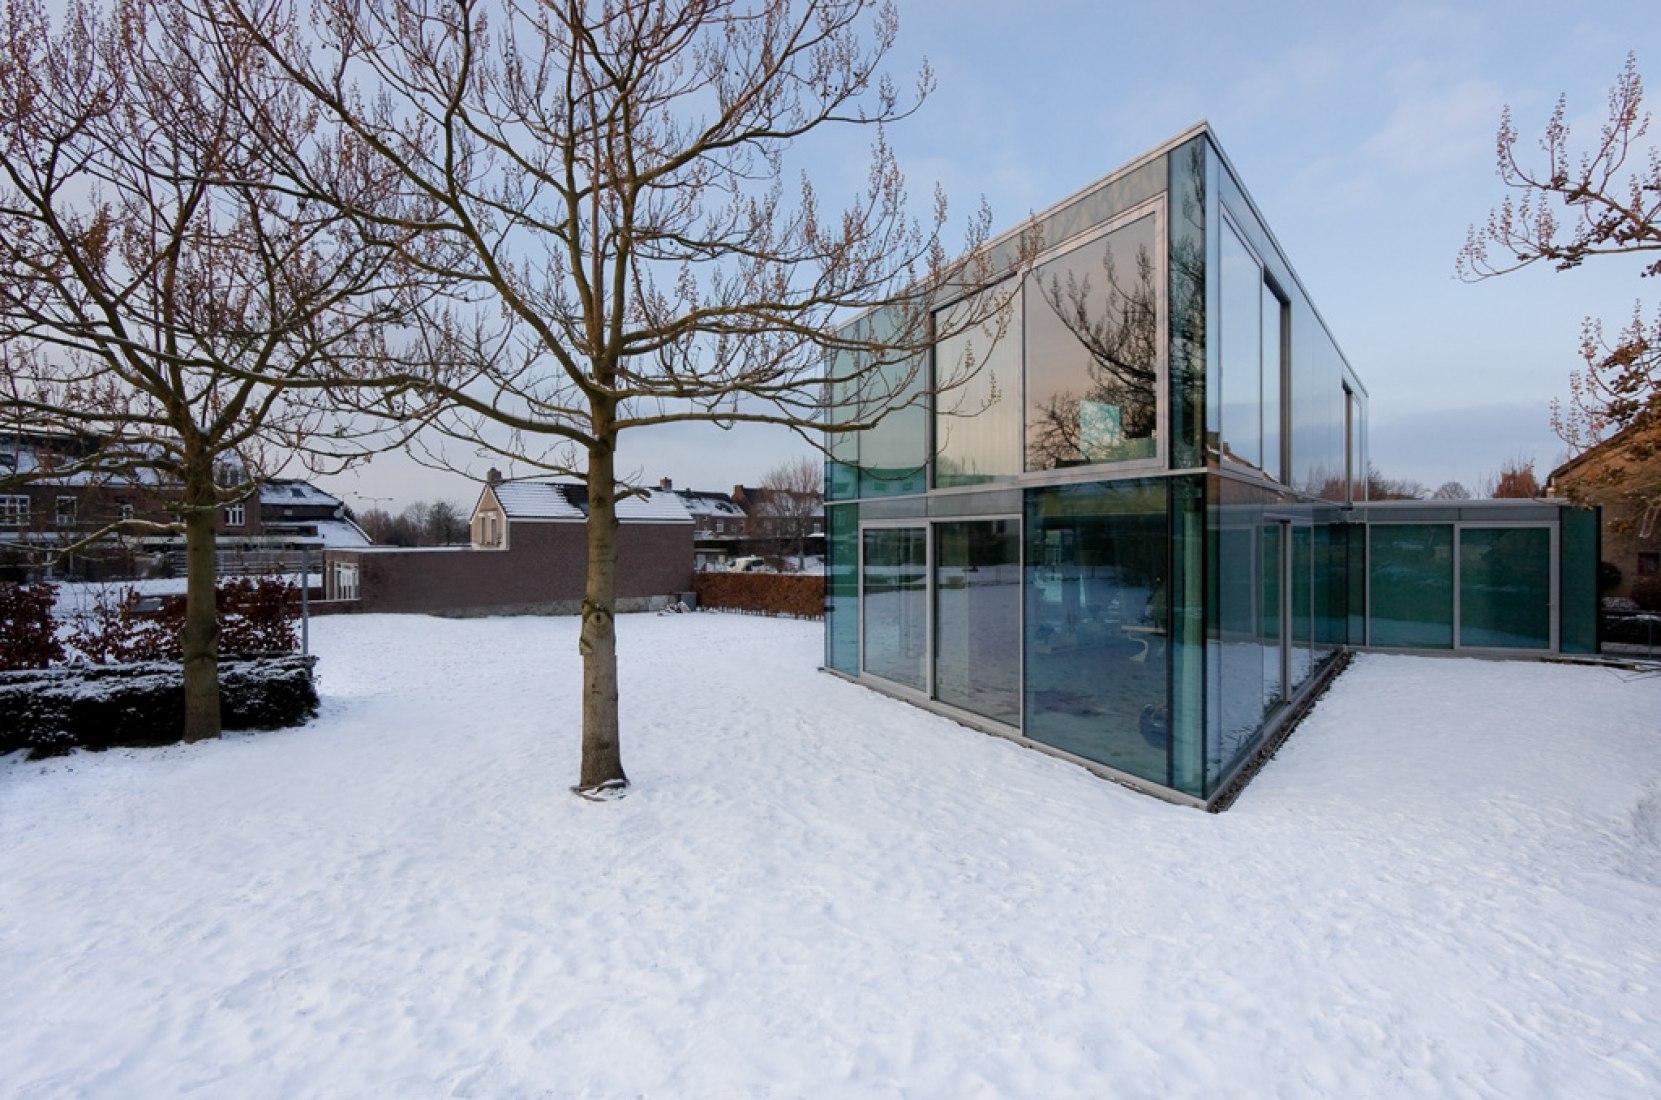 H House by Wiel Arets. Photography © Joao Morgado